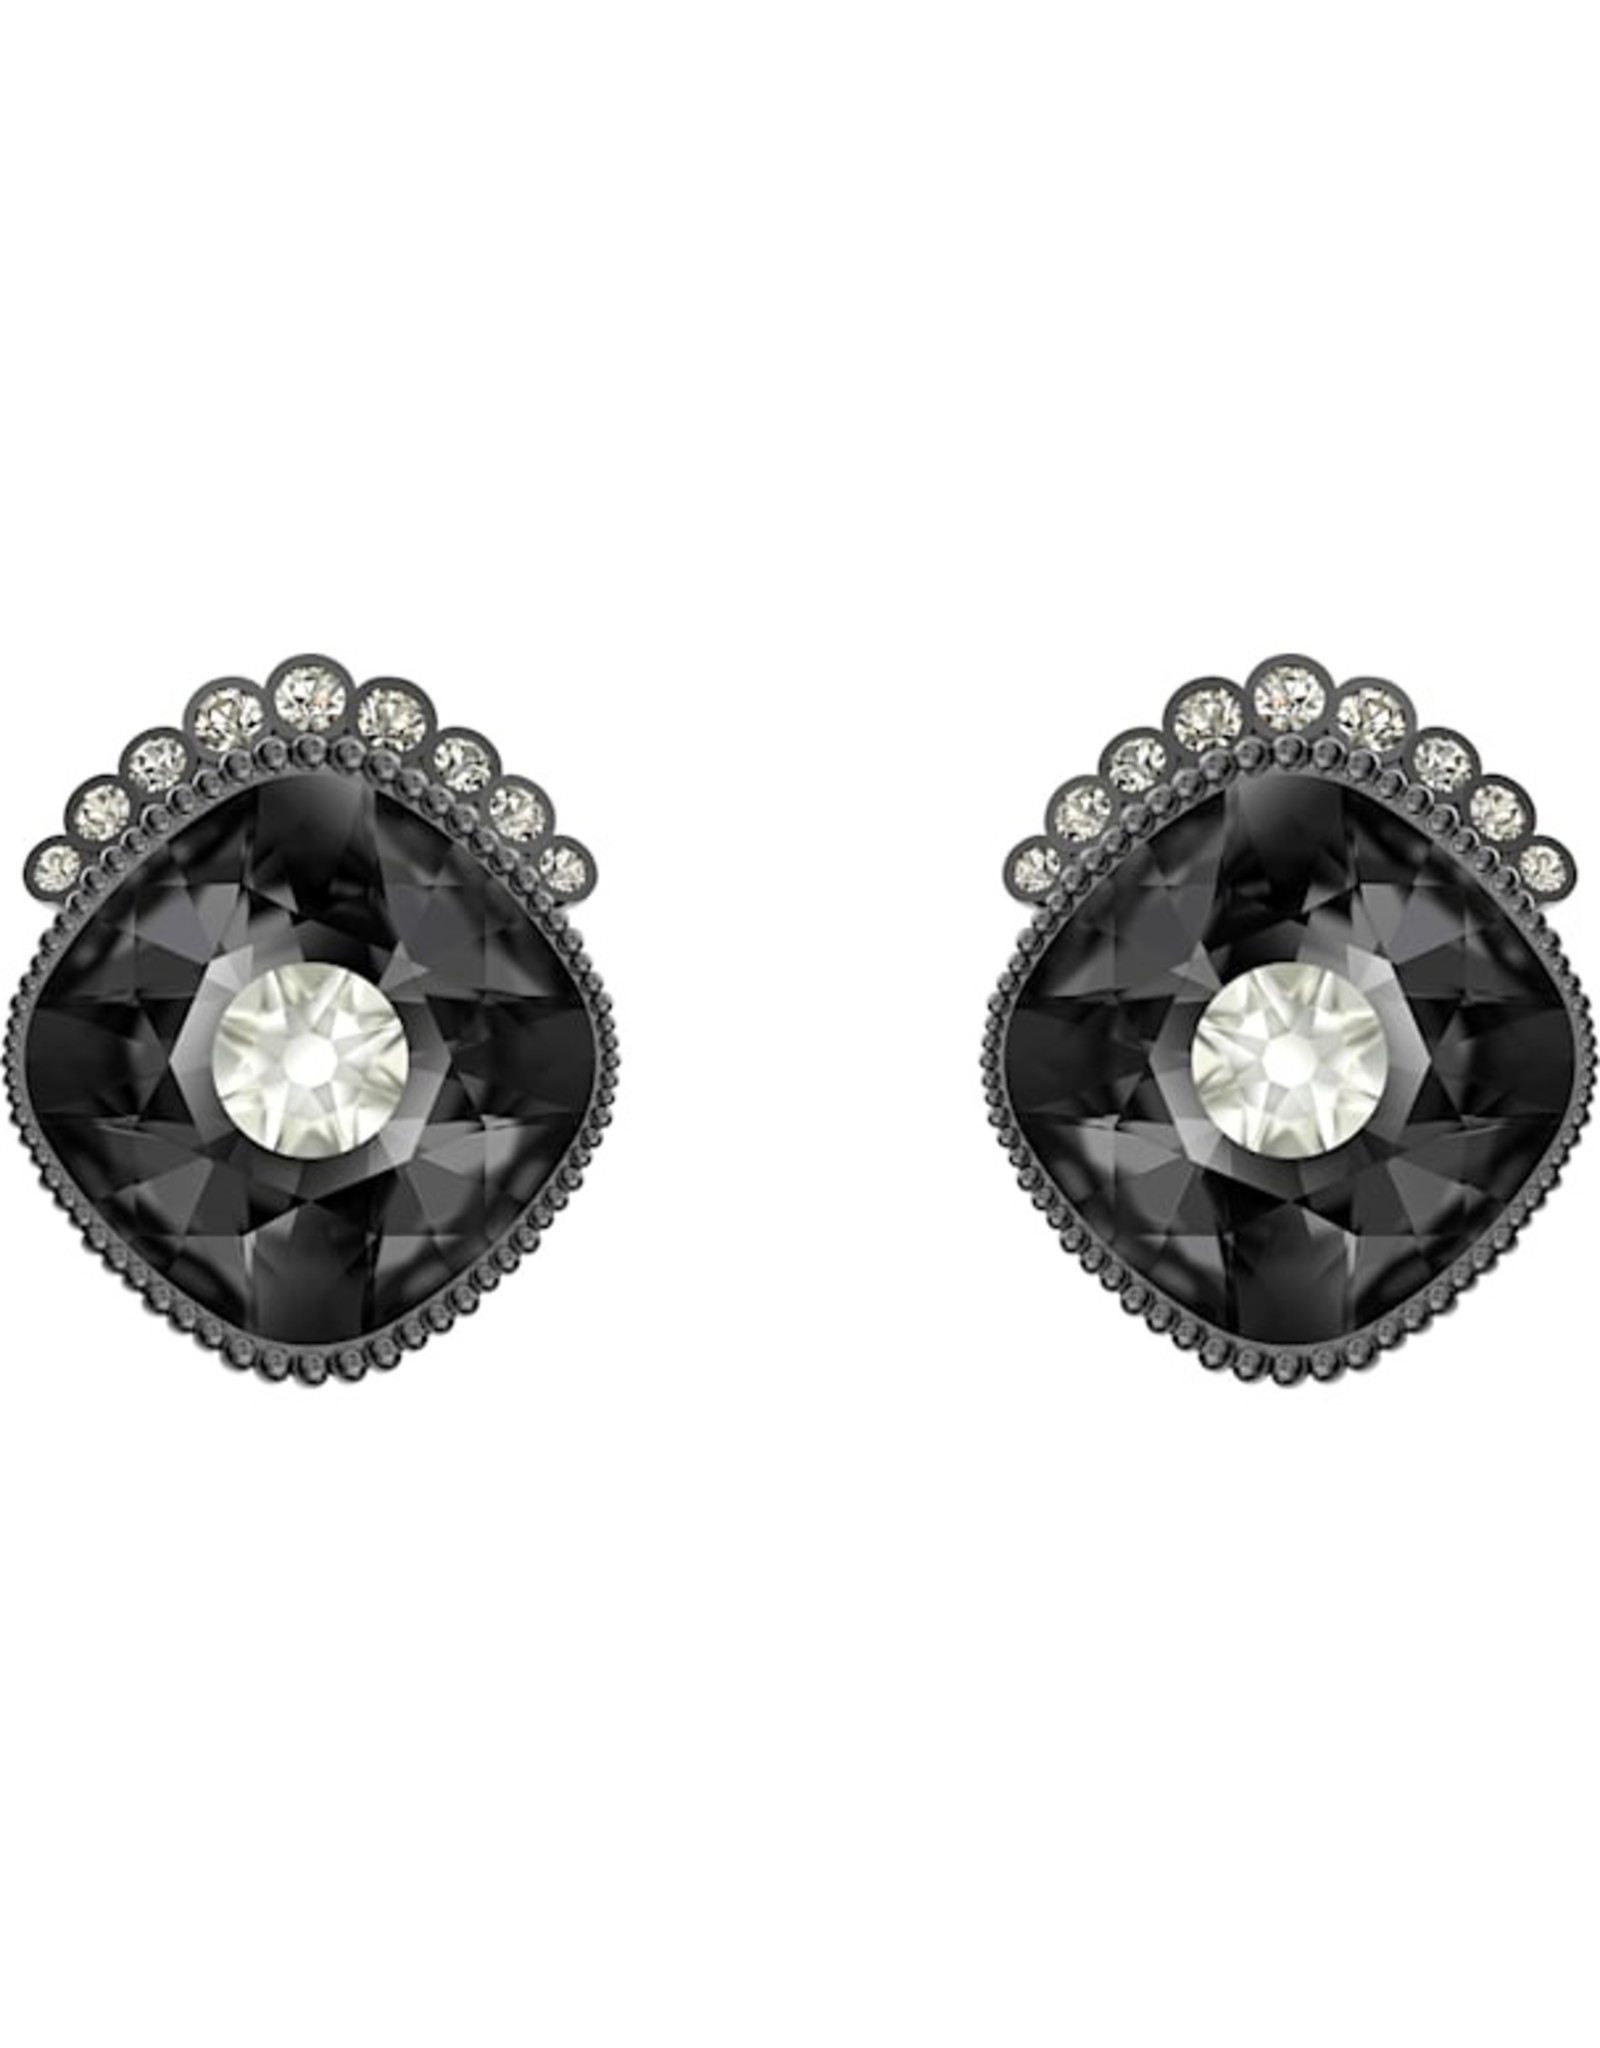 Swarovski Swarovski Black Baroque Stud Earrings